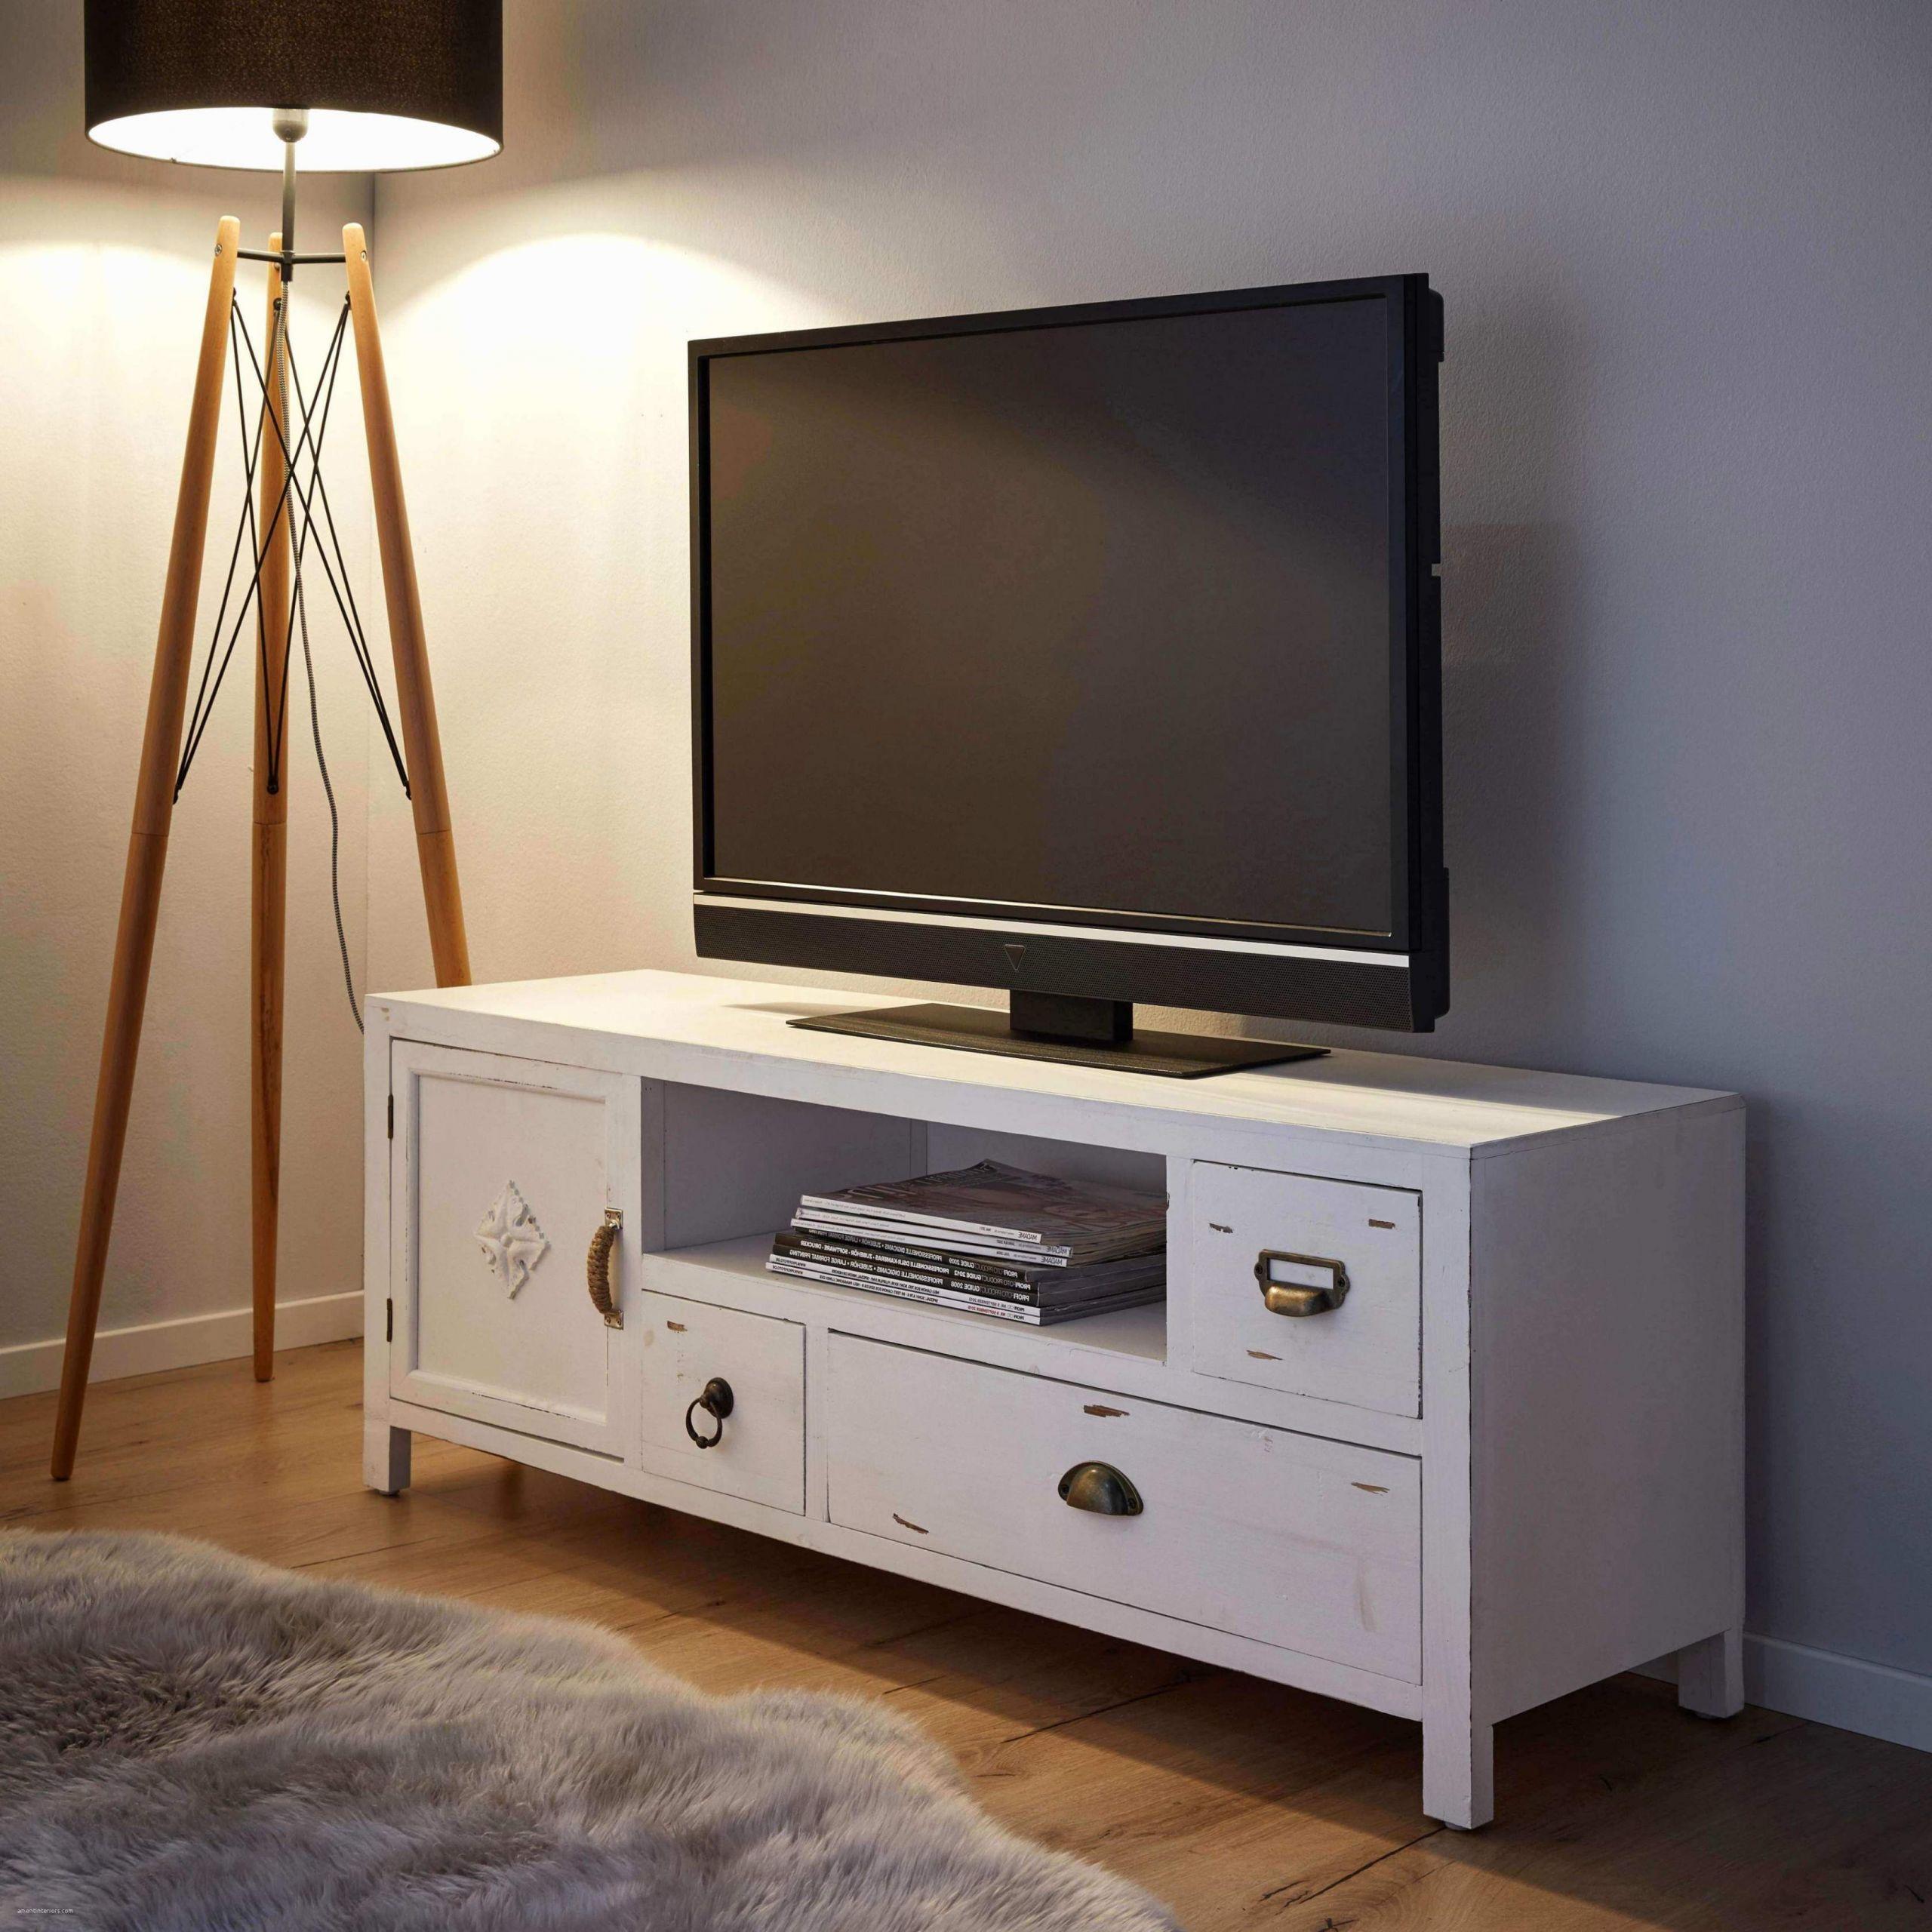 35 minimaliste ikea expedit tv mobel weis ikea kallax hacks ikea kallax hacks 4